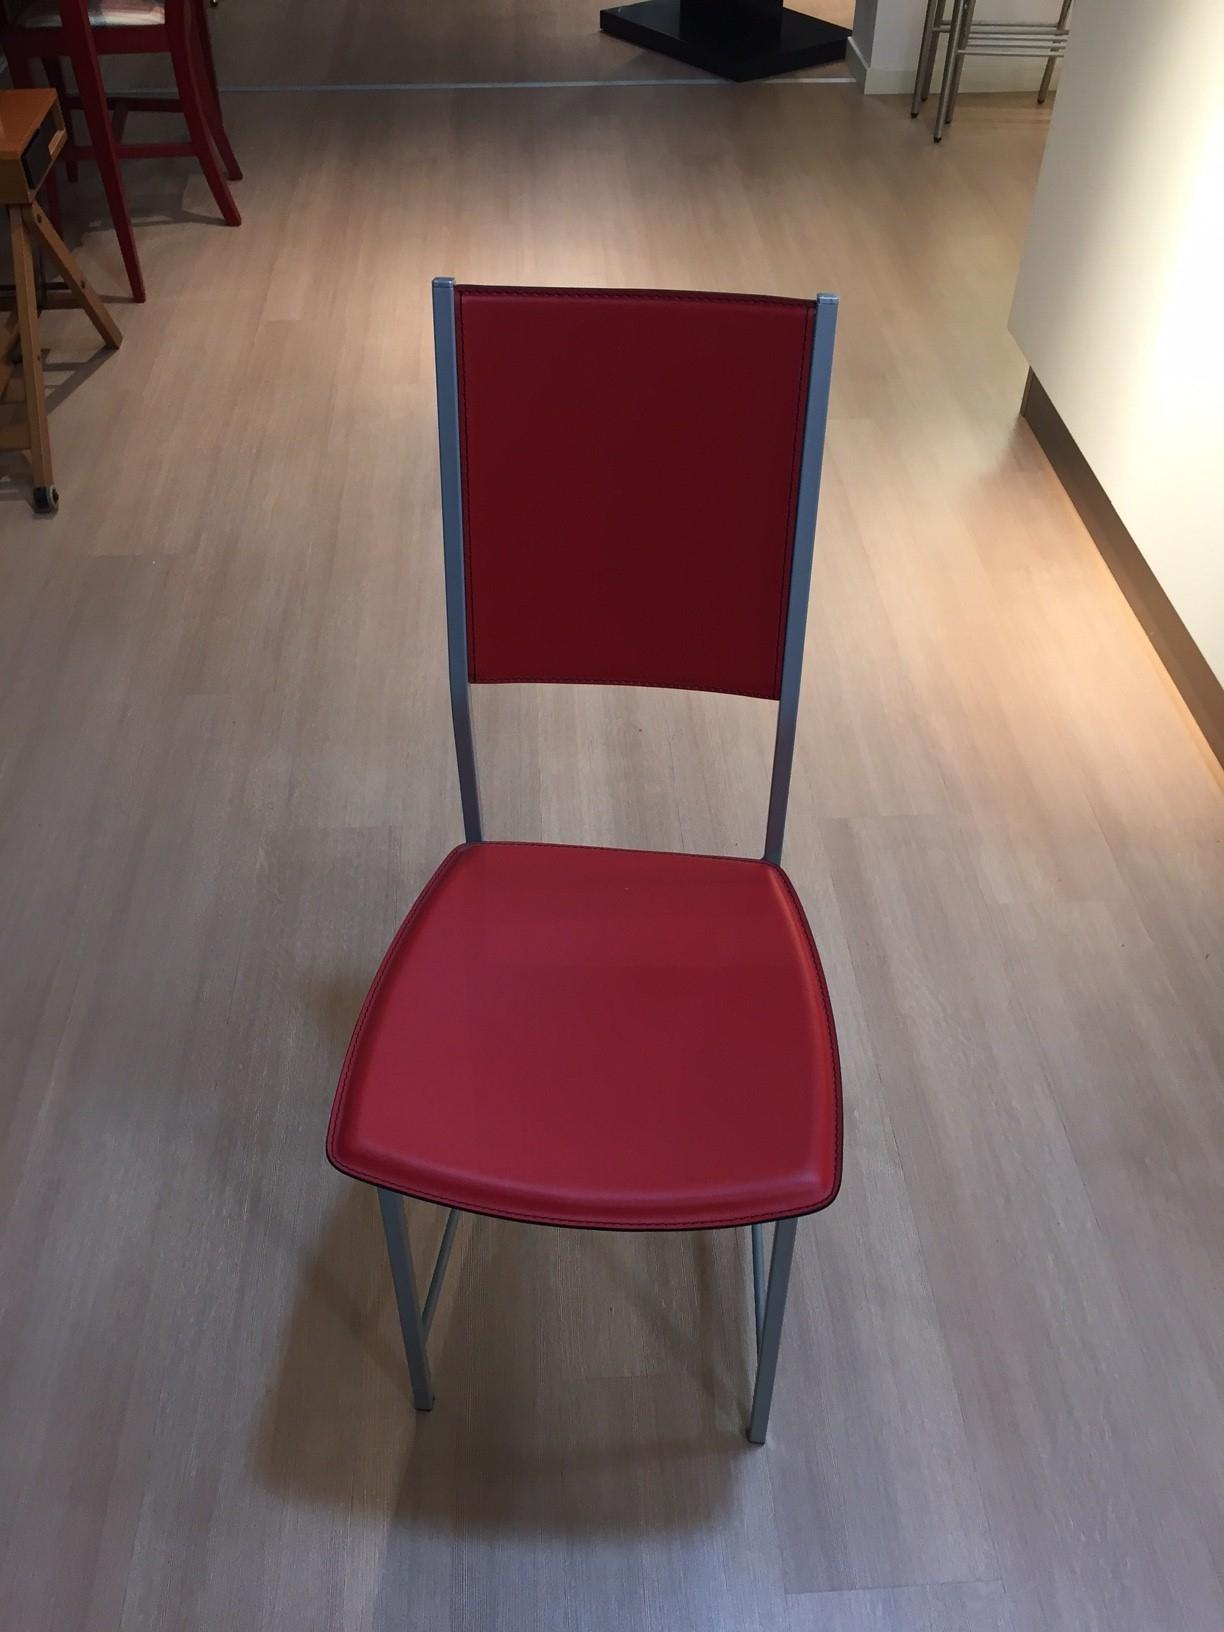 Sedia alessia in cuoio rosso di cattelan itala sedie a for Sedie di marca